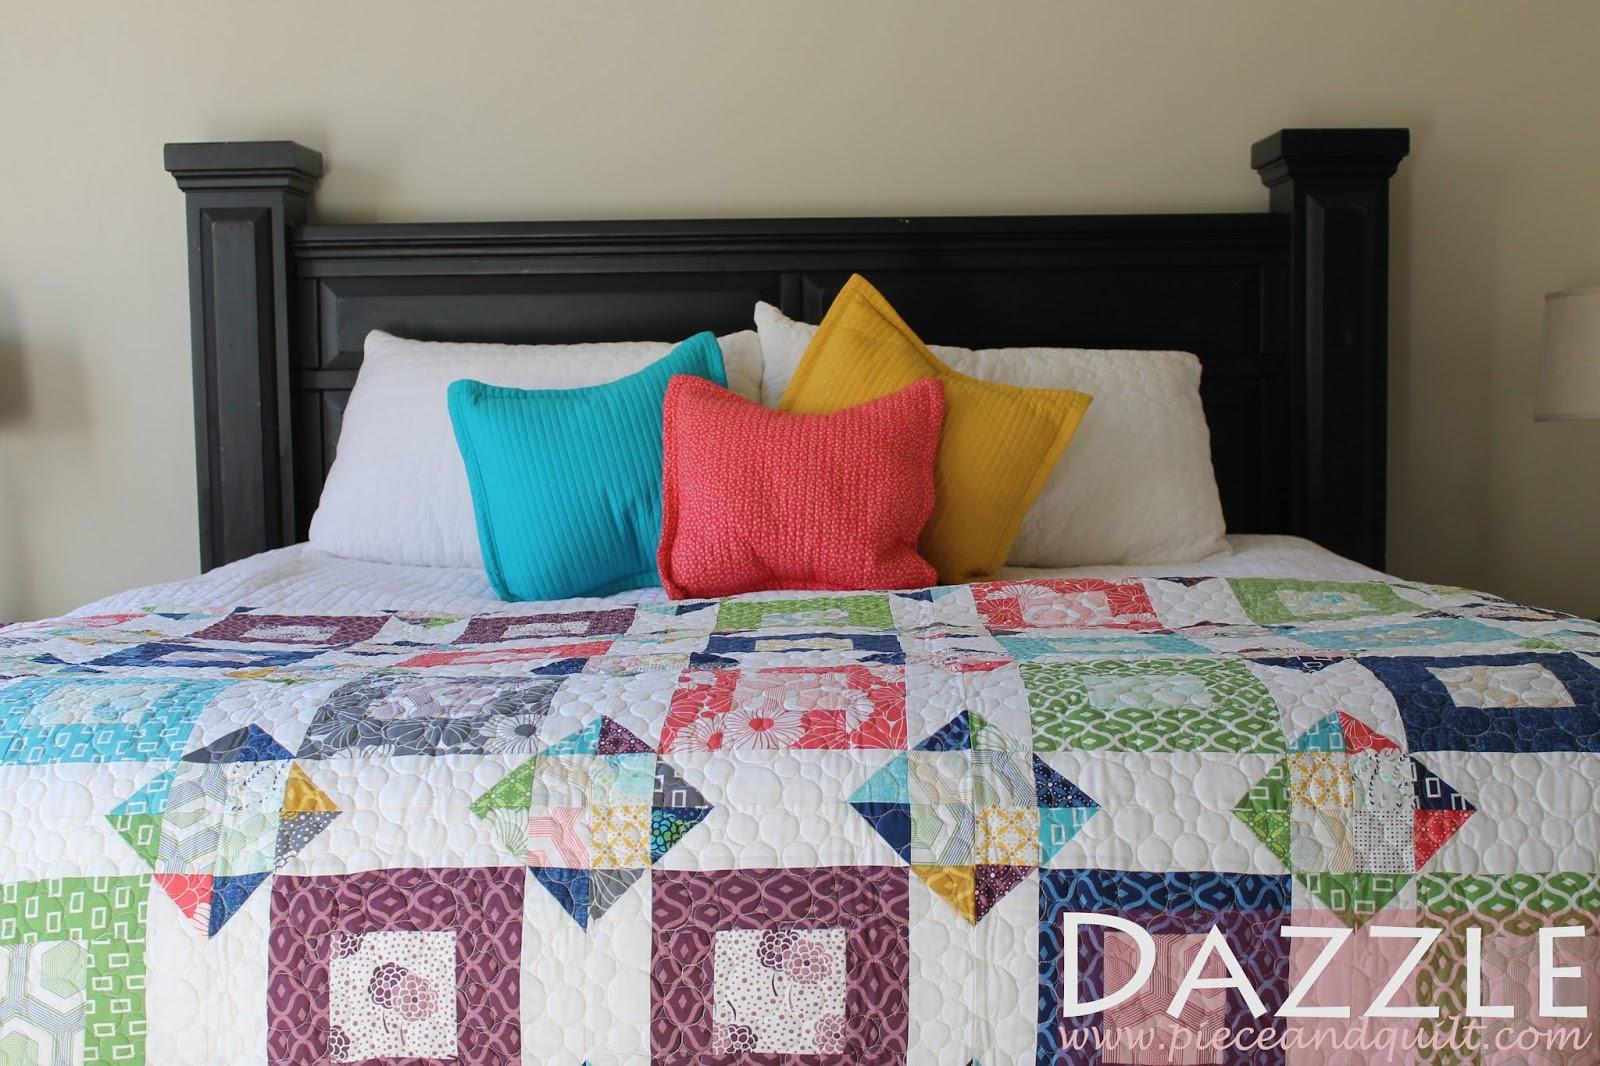 Piece N Quilt: Dazzle - Cabin Fever: 20 Modern Log Cabin Quilts : log cabin style quilts - Adamdwight.com